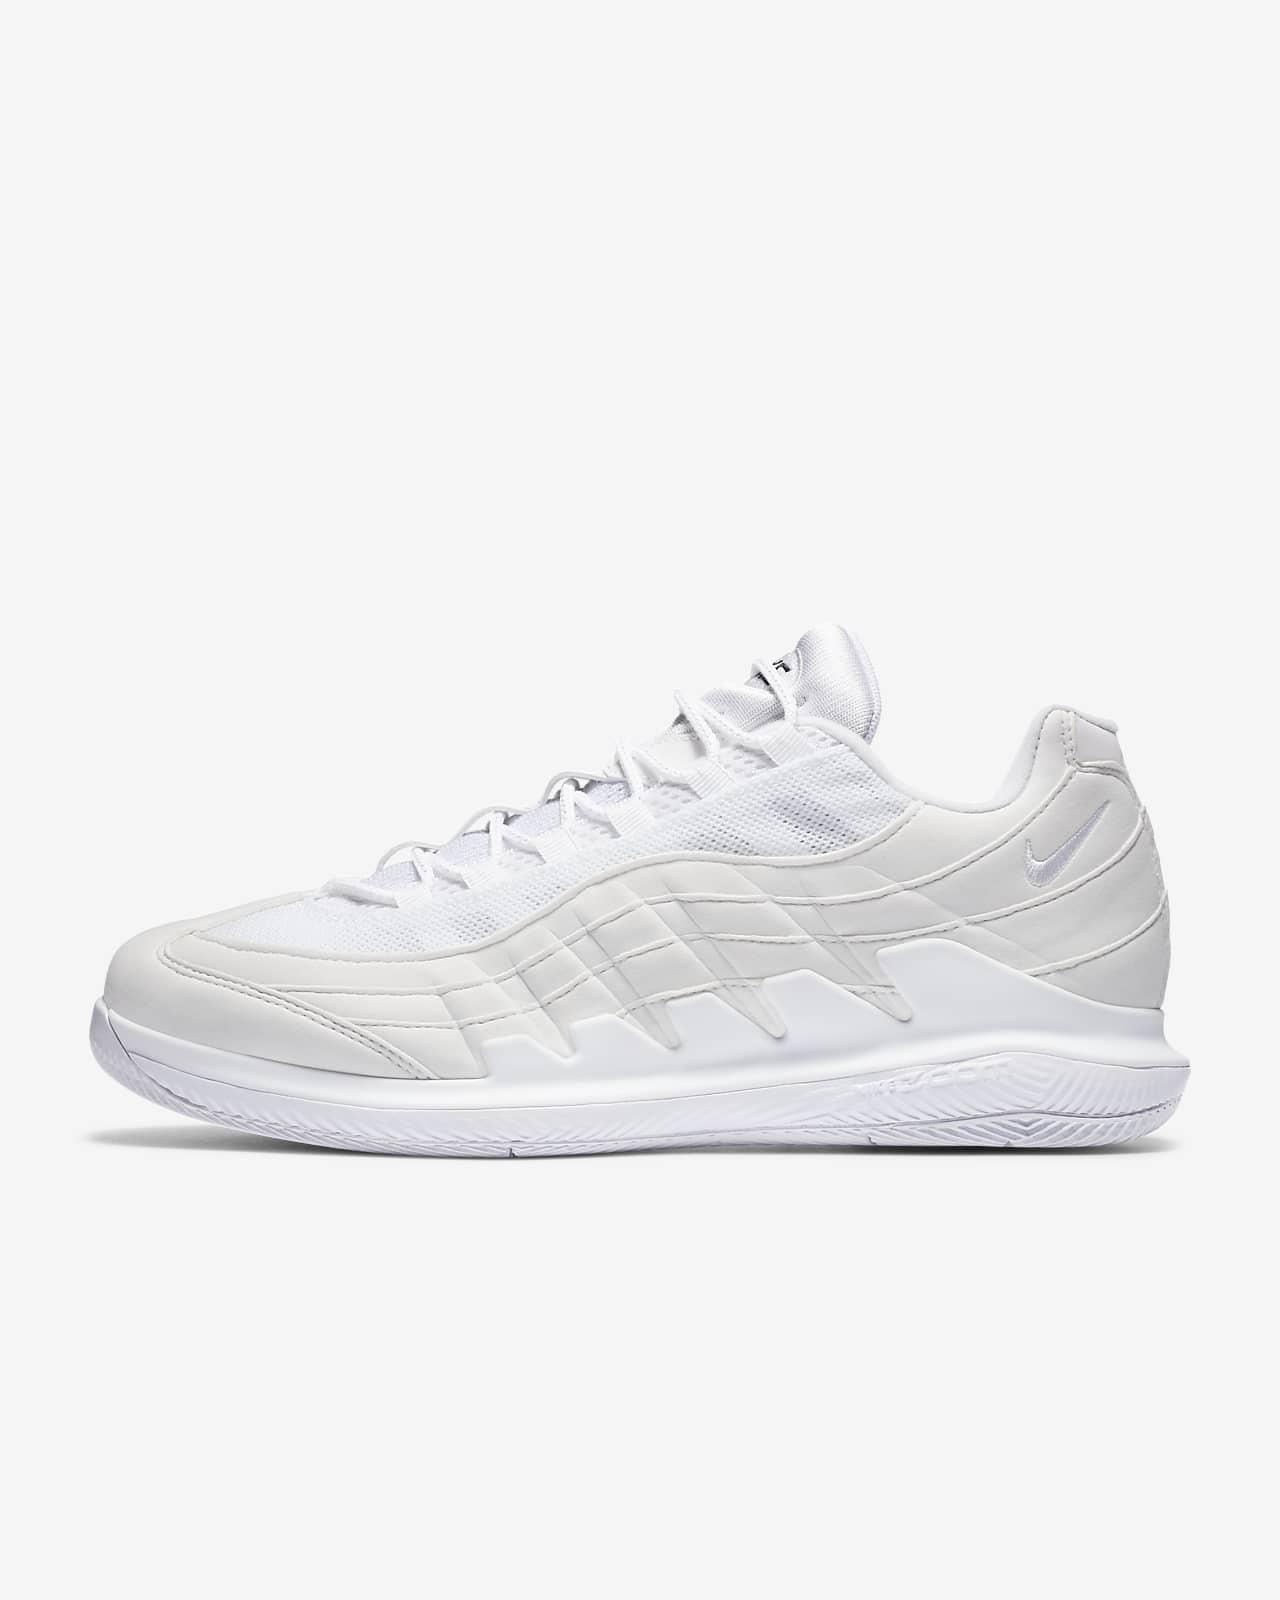 NikeCourt Zoom Vapor X Air Max 95 Zapatillas de tenis - Hombre